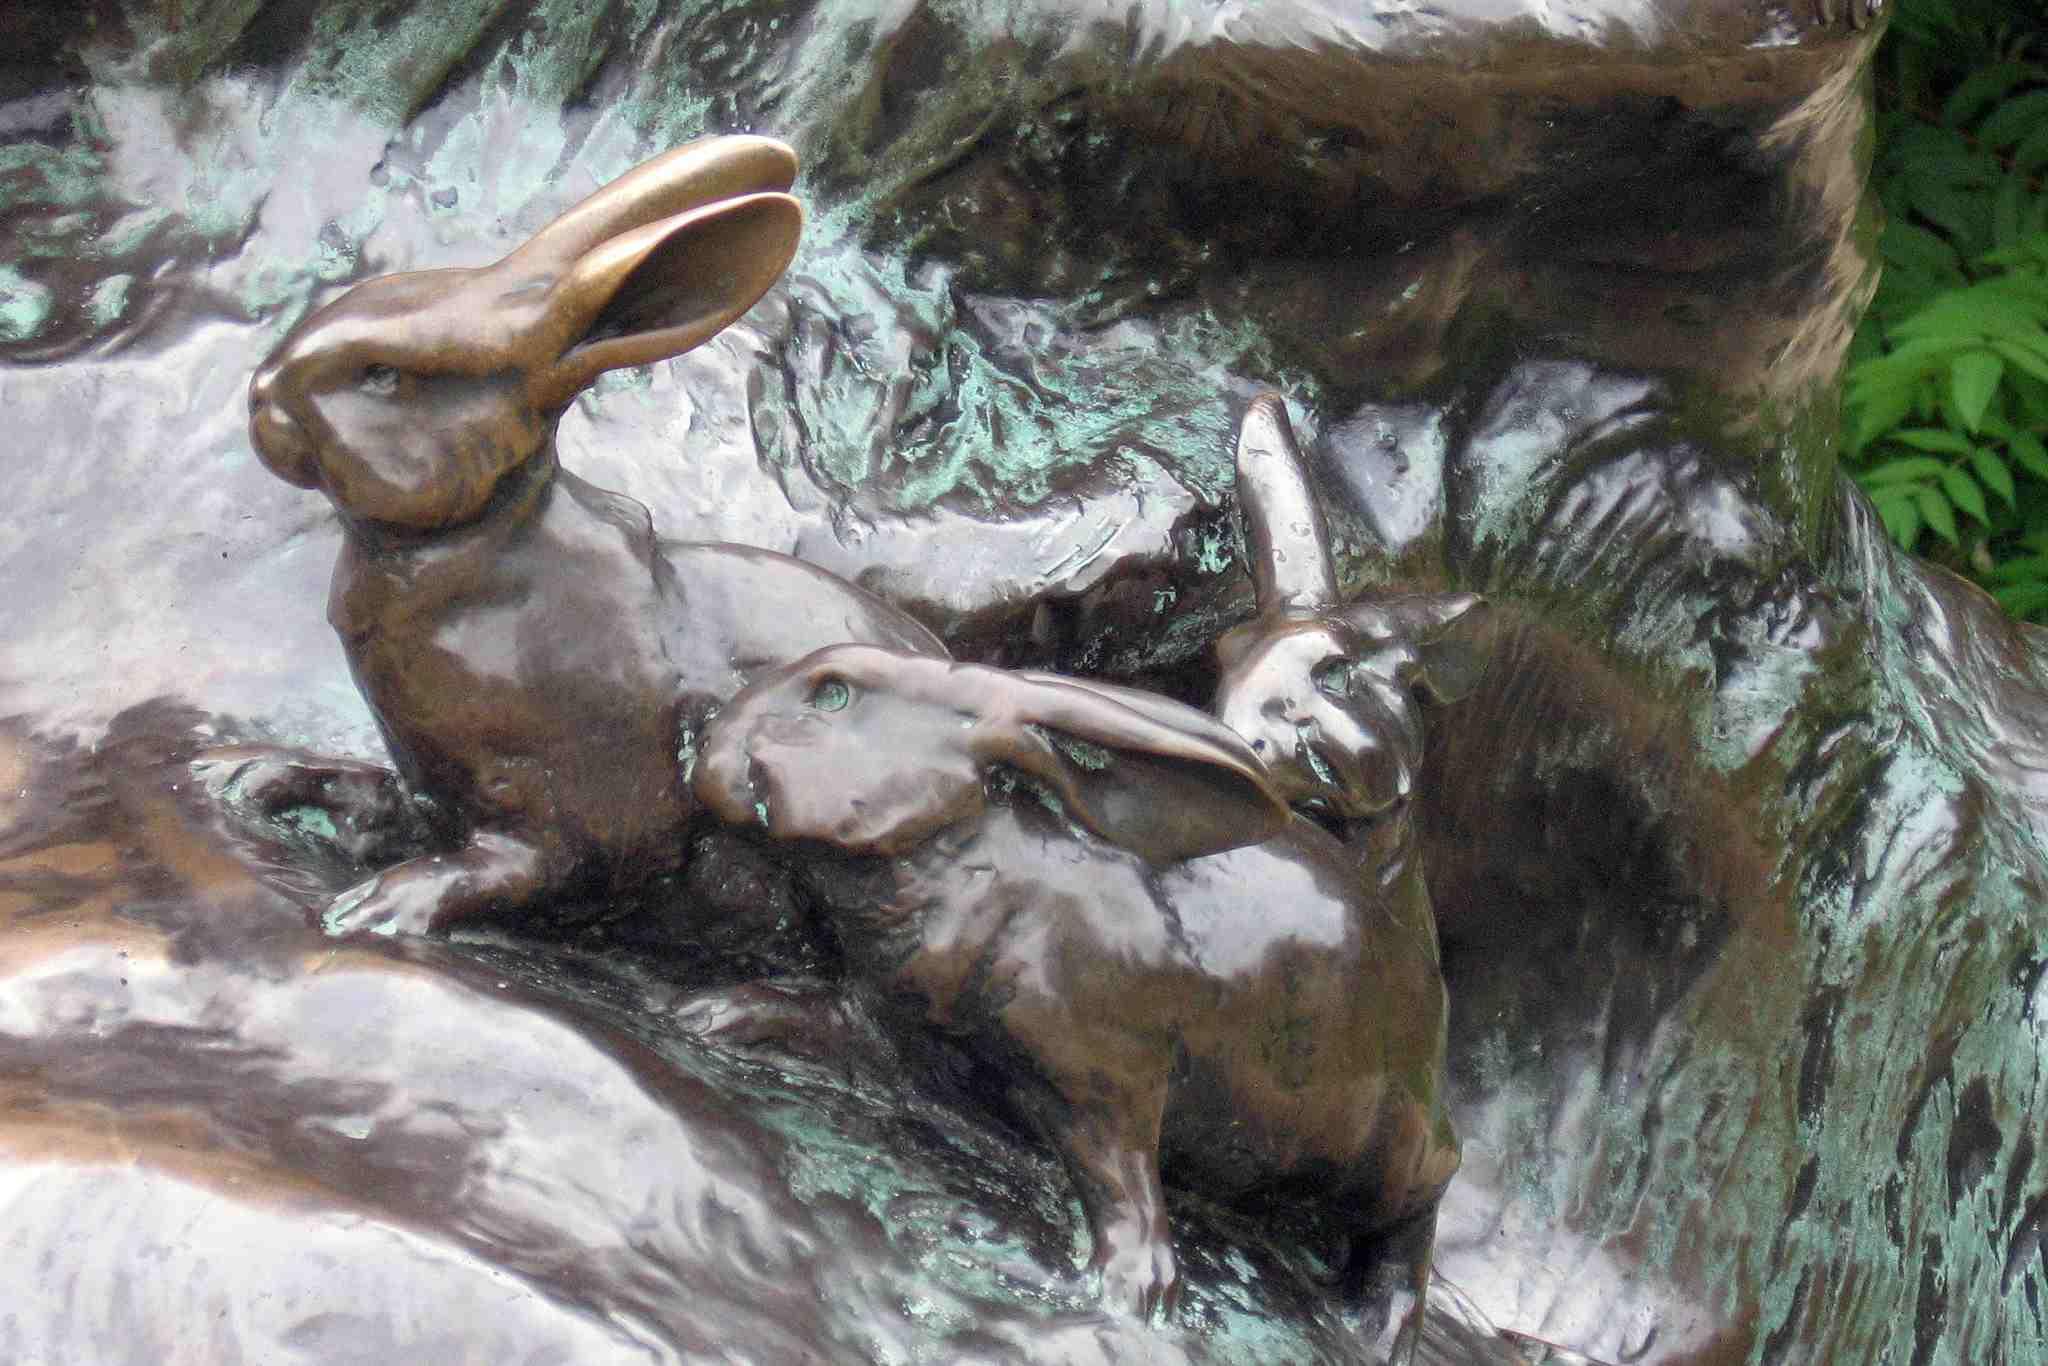 Peter Pan statue rabbit